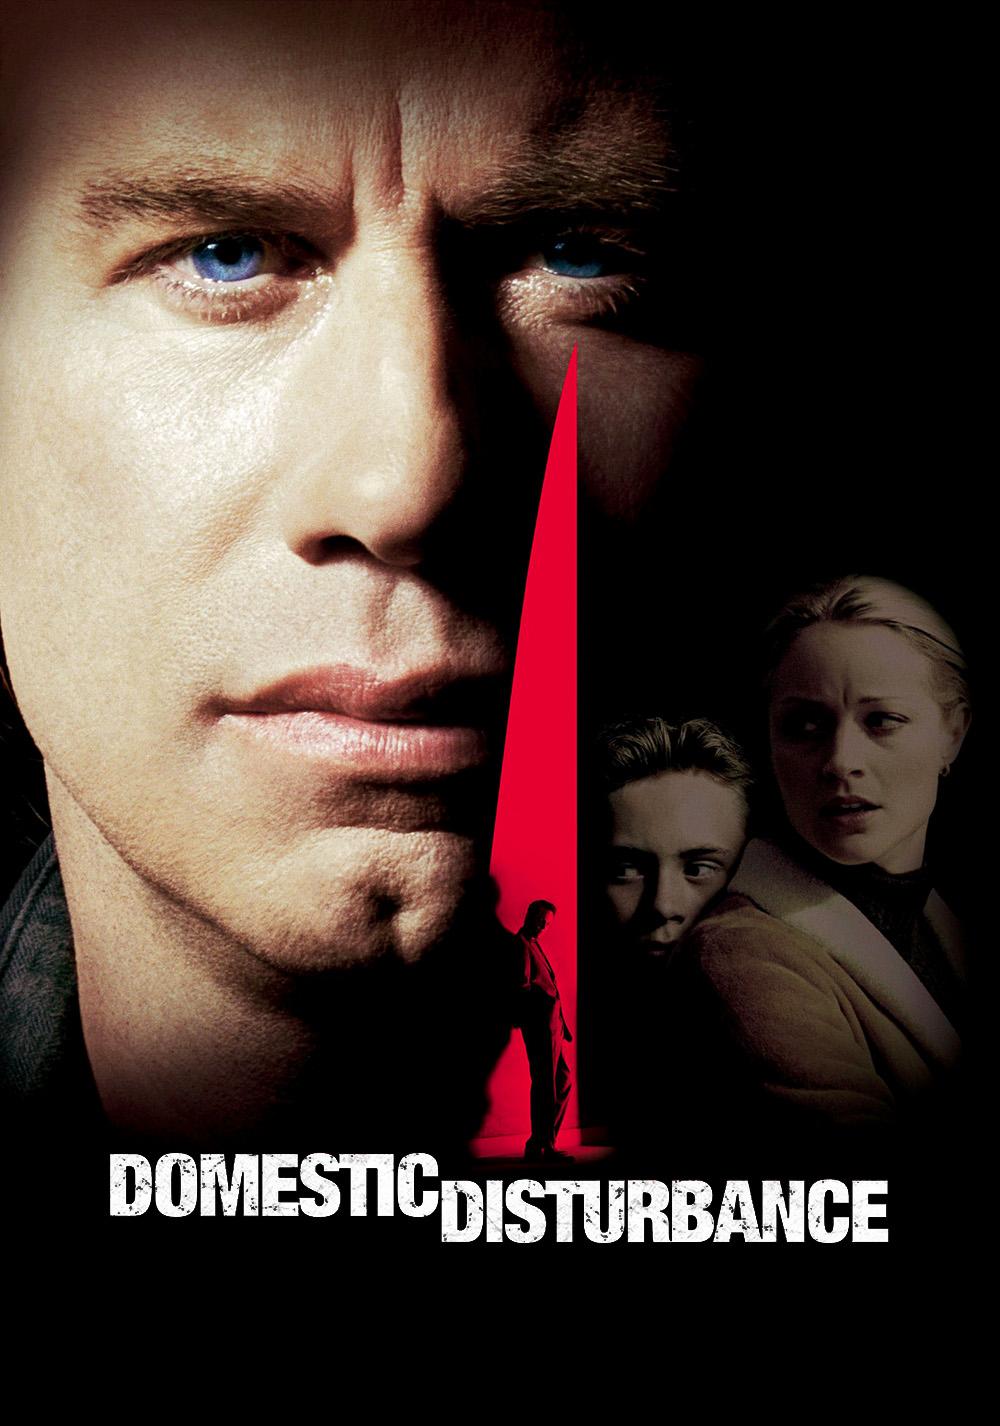 domestic disturbance movie fanart fanarttv